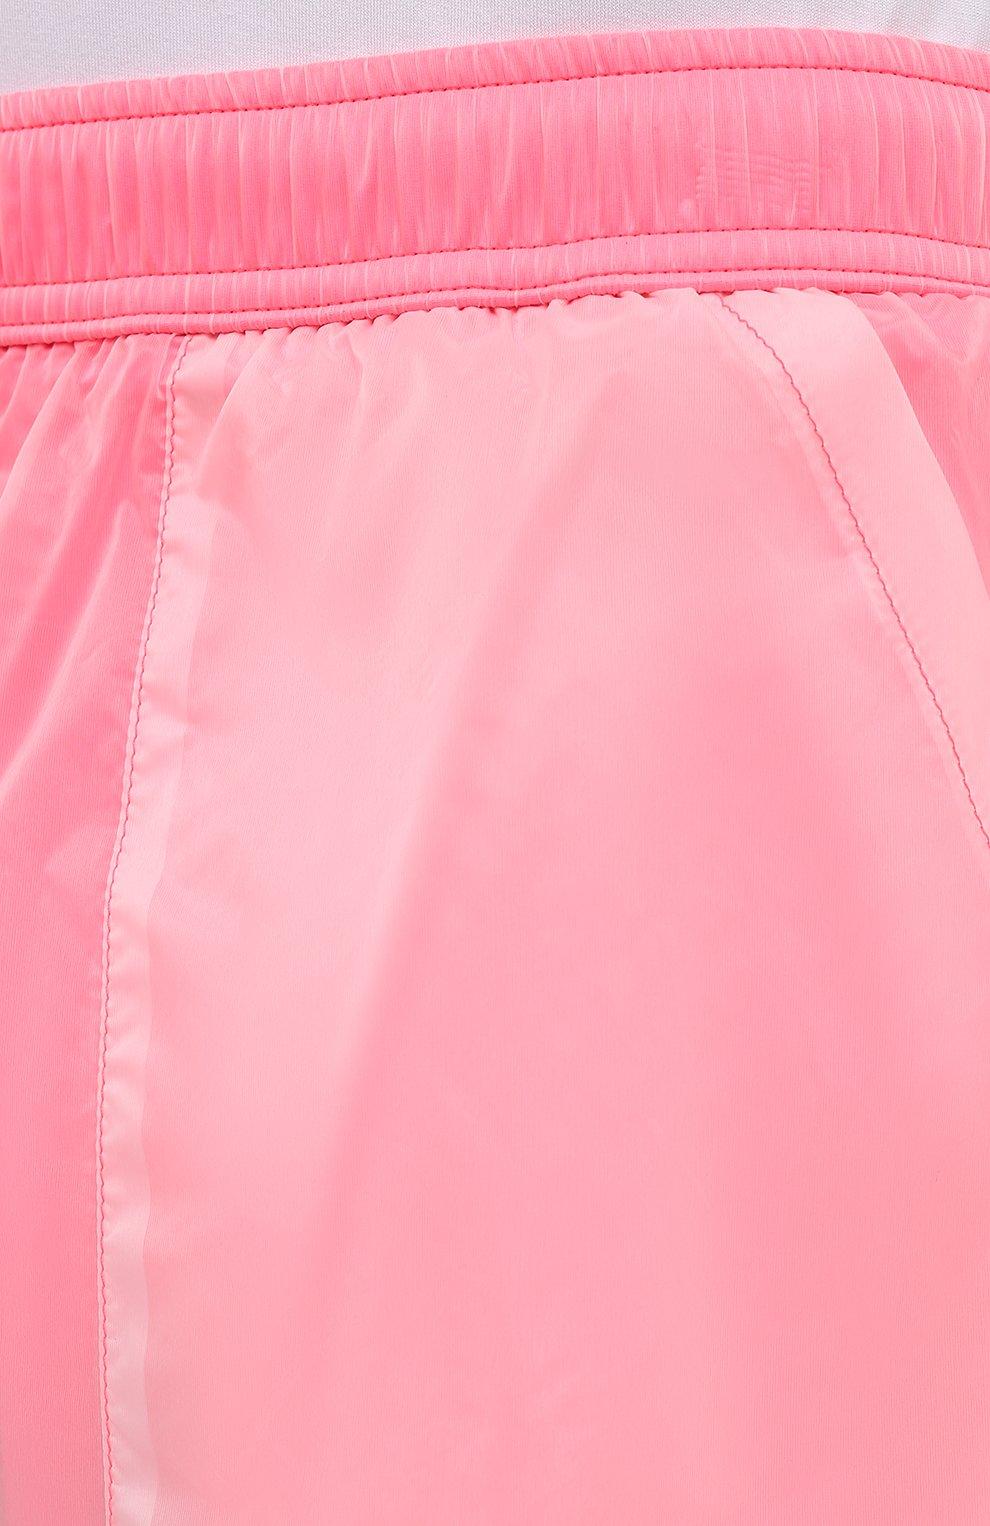 Мужские плавки-шорты MOSCHINO розового цвета, арт. A6164/2313   Фото 5 (Принт: Без принта; Материал внешний: Синтетический материал; Мужское Кросс-КТ: плавки-шорты)